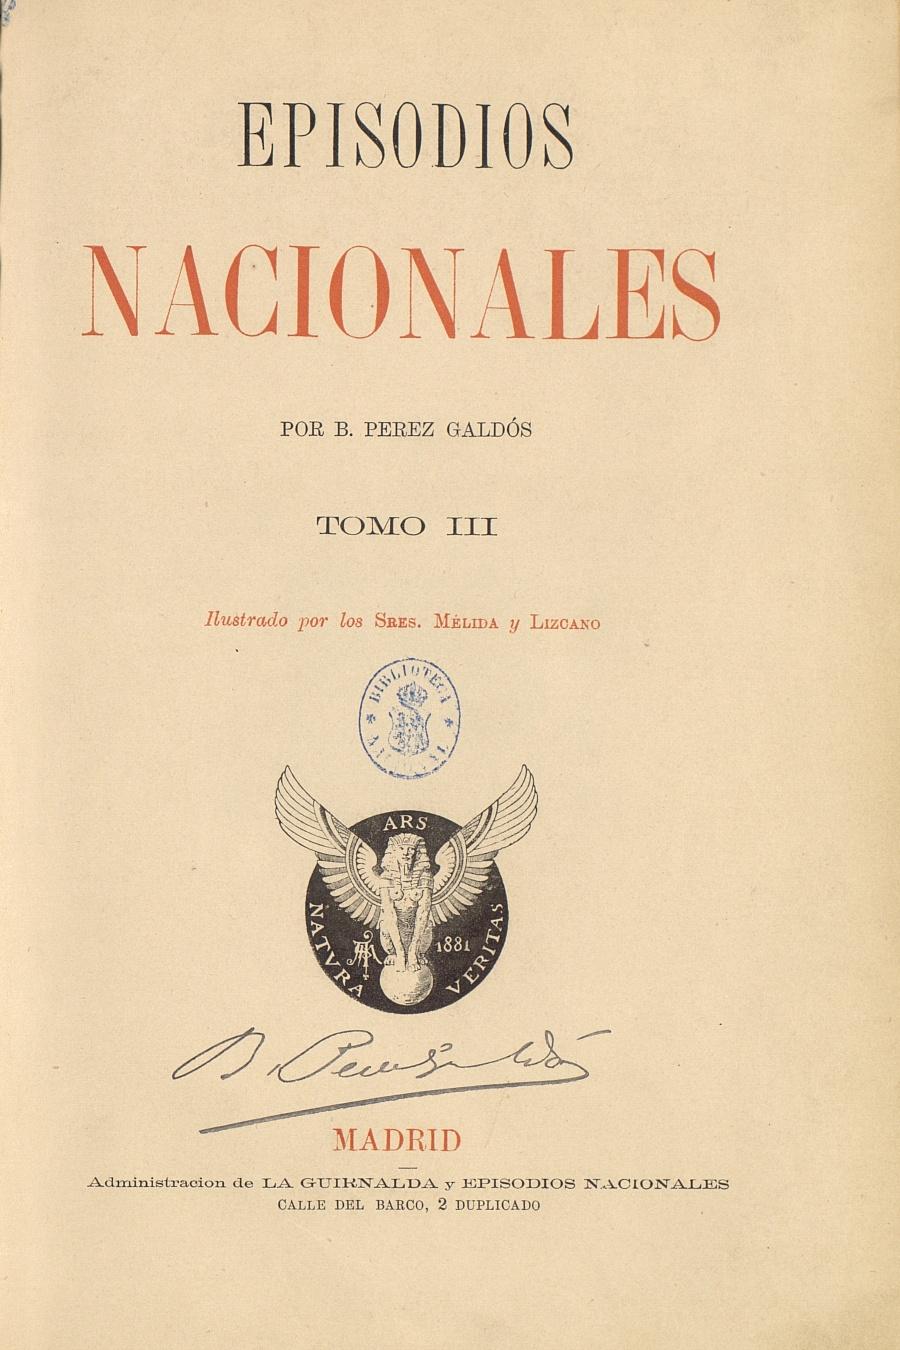 Año Galdós El espíritu de Benito Pérez Galdós impregna el